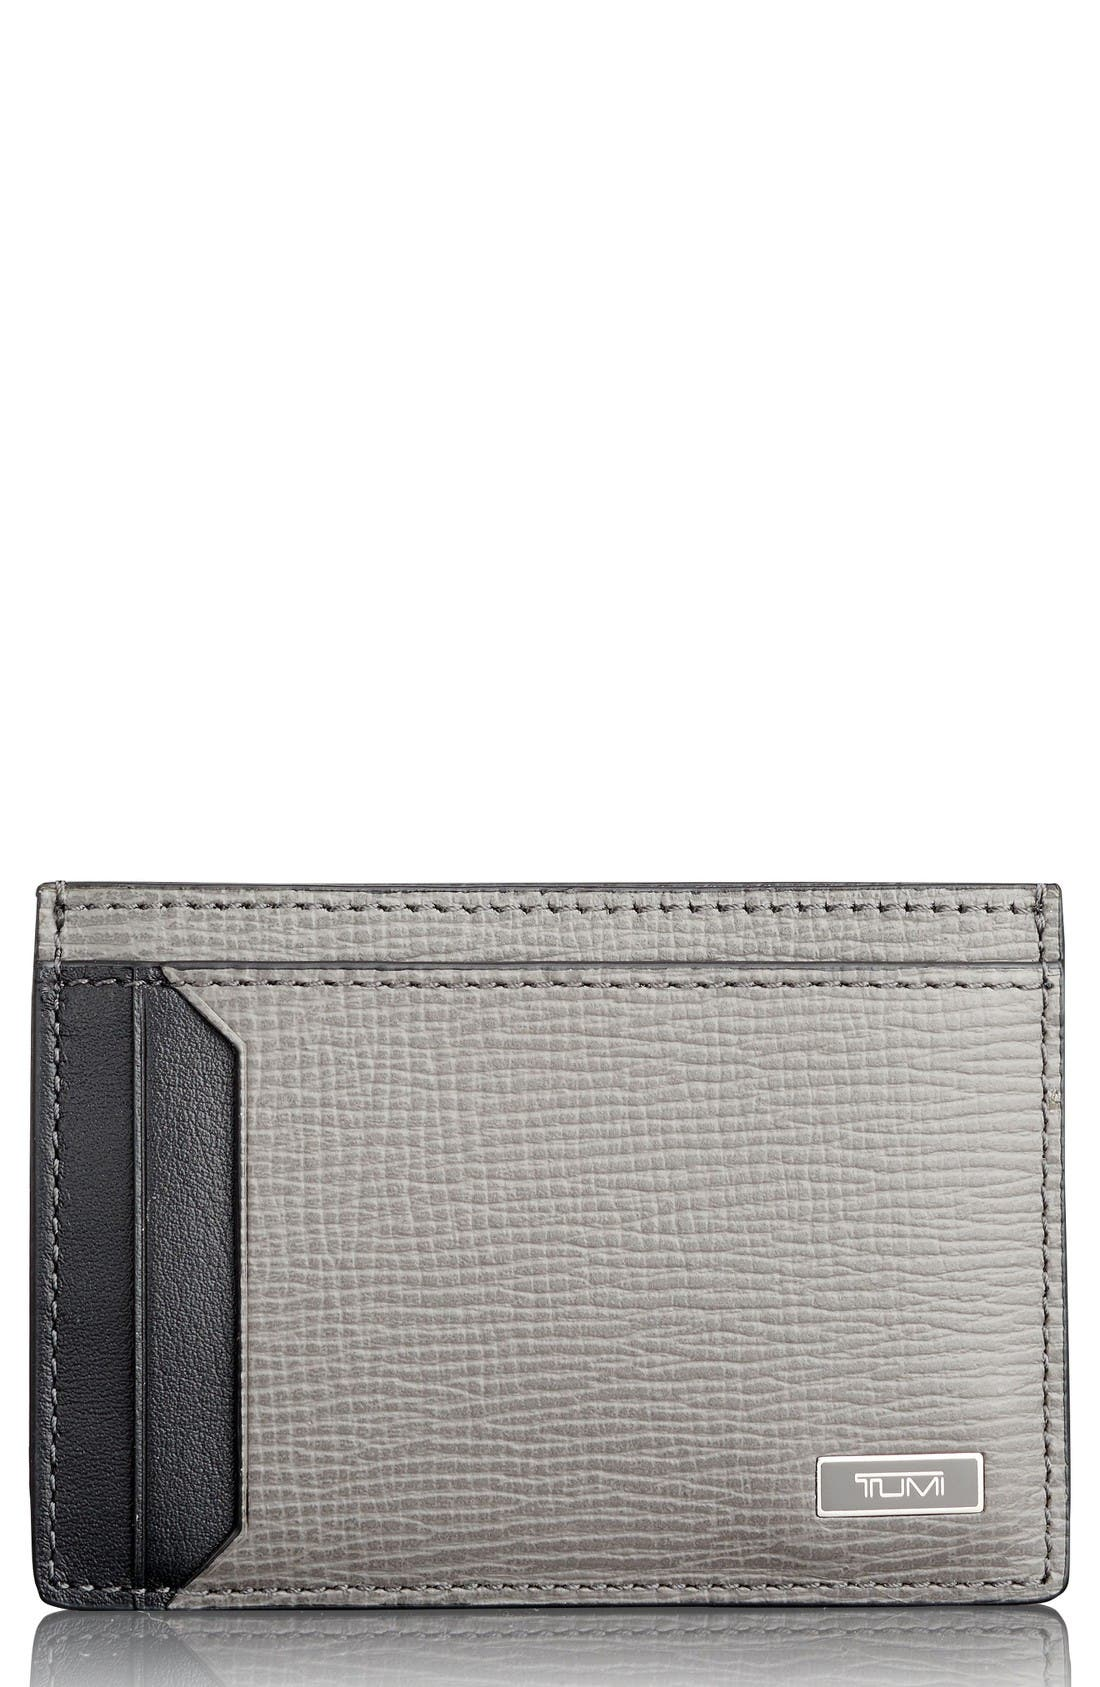 Monaco Leather RFID Money Clip Card Case,                             Main thumbnail 1, color,                             Grey